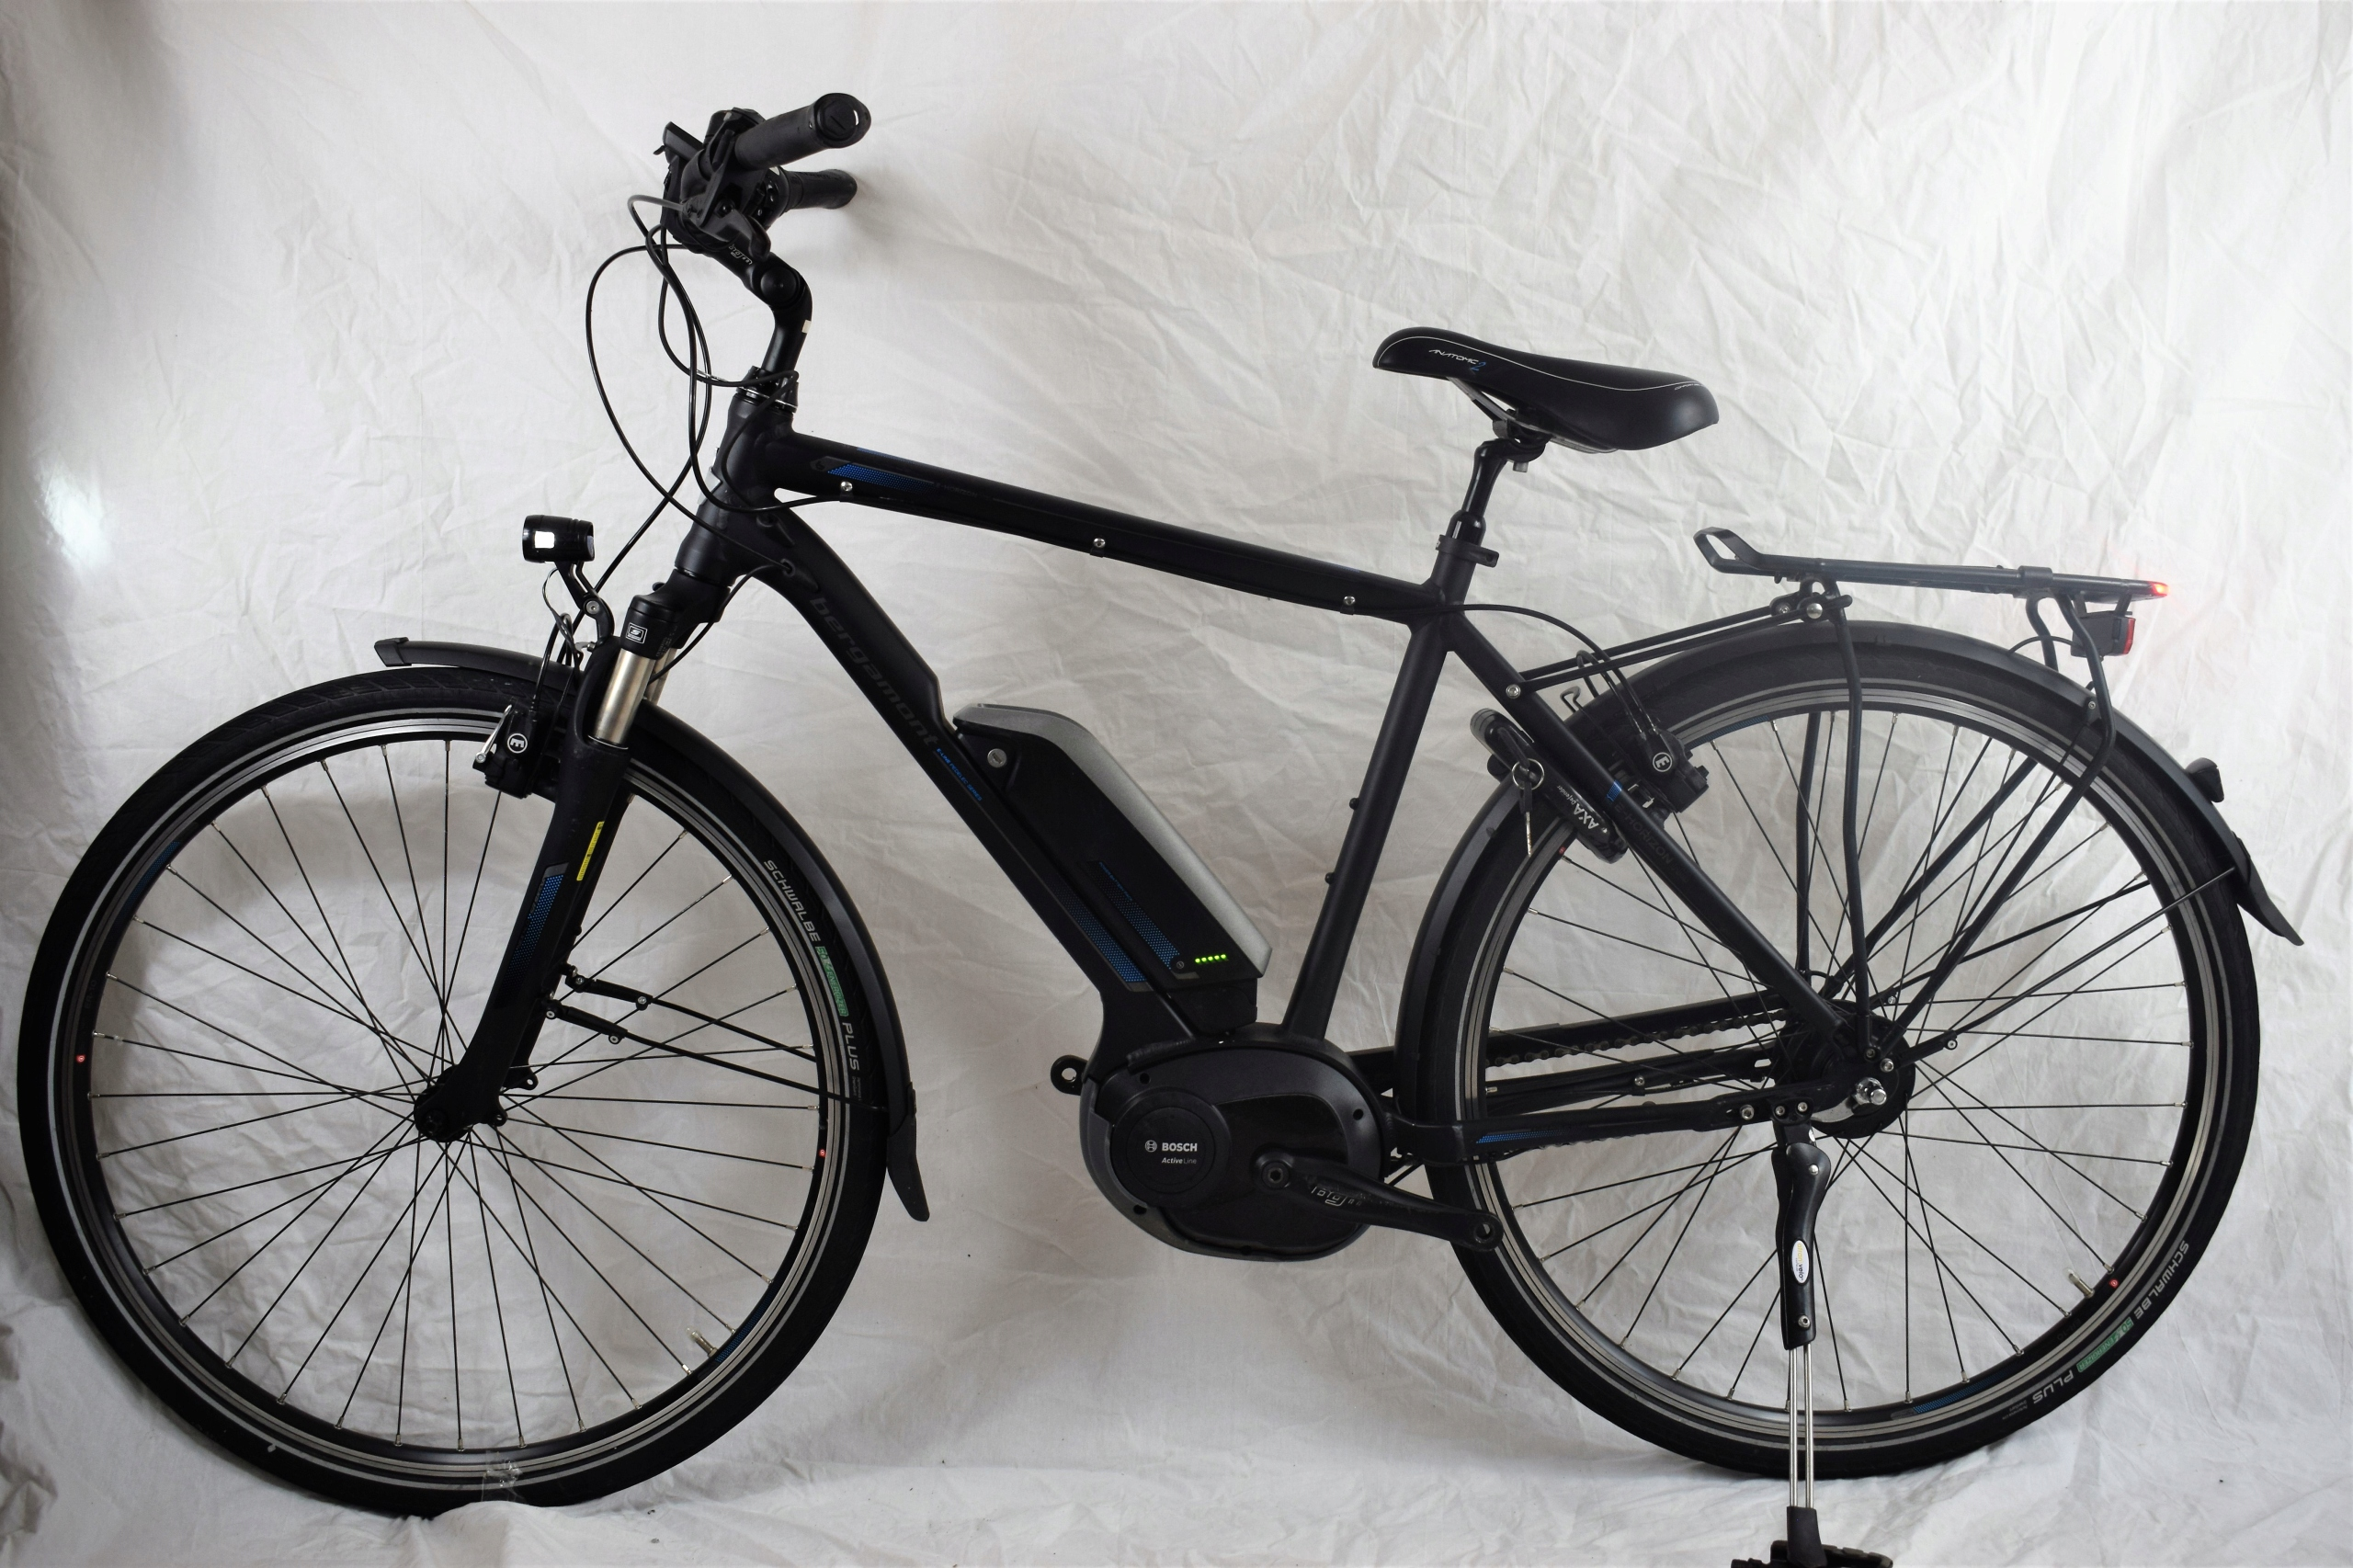 Rower Elektryczny Bergamont Bosch Jak Nowy 28* HIT